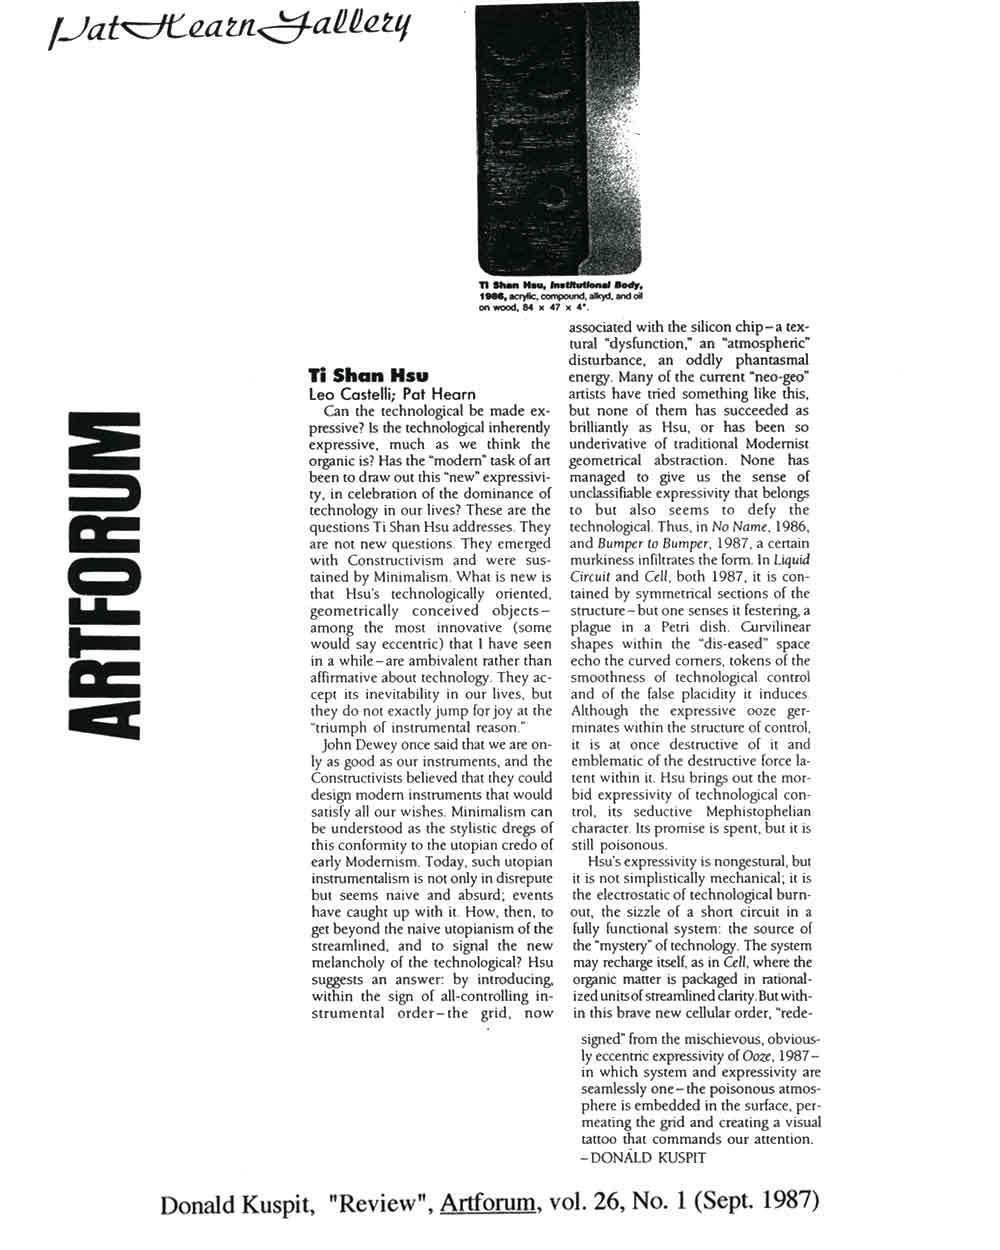 Tishan Hsu, article in Artforum